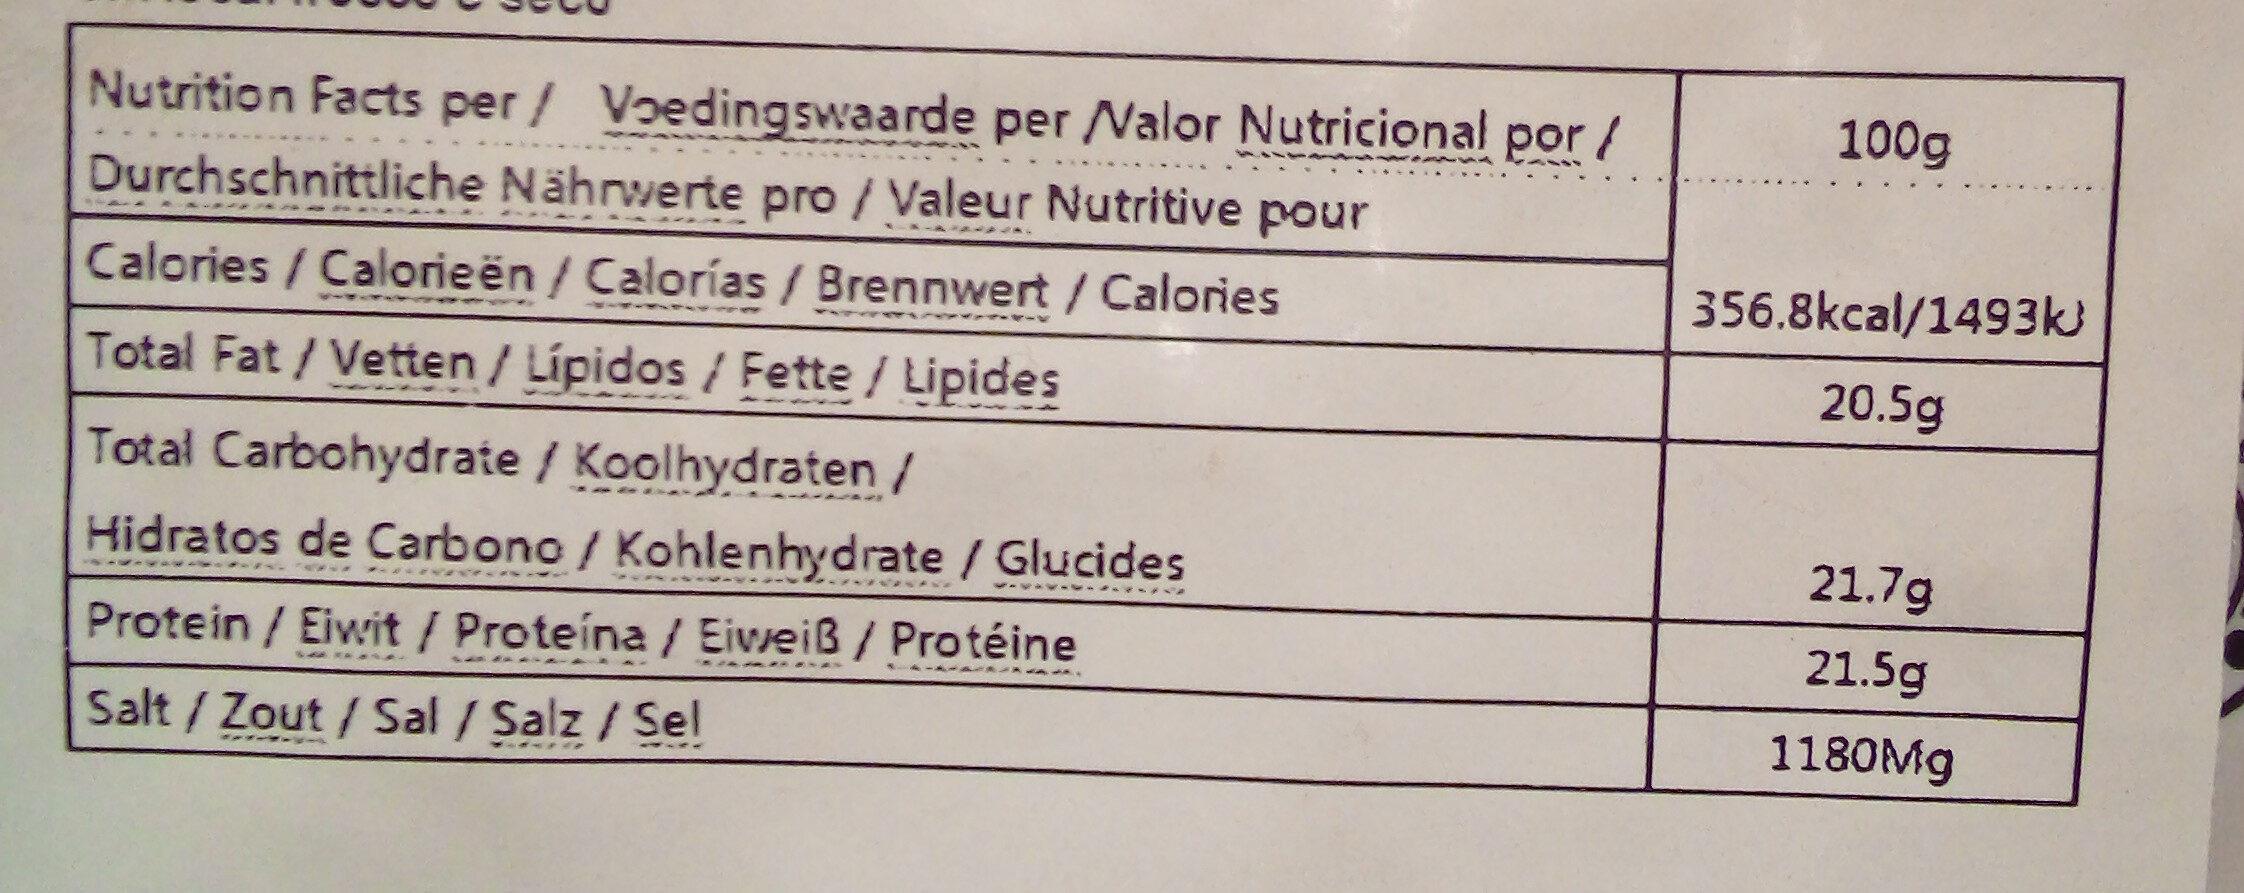 WLM Snack Gluten Large - Voedingswaarden